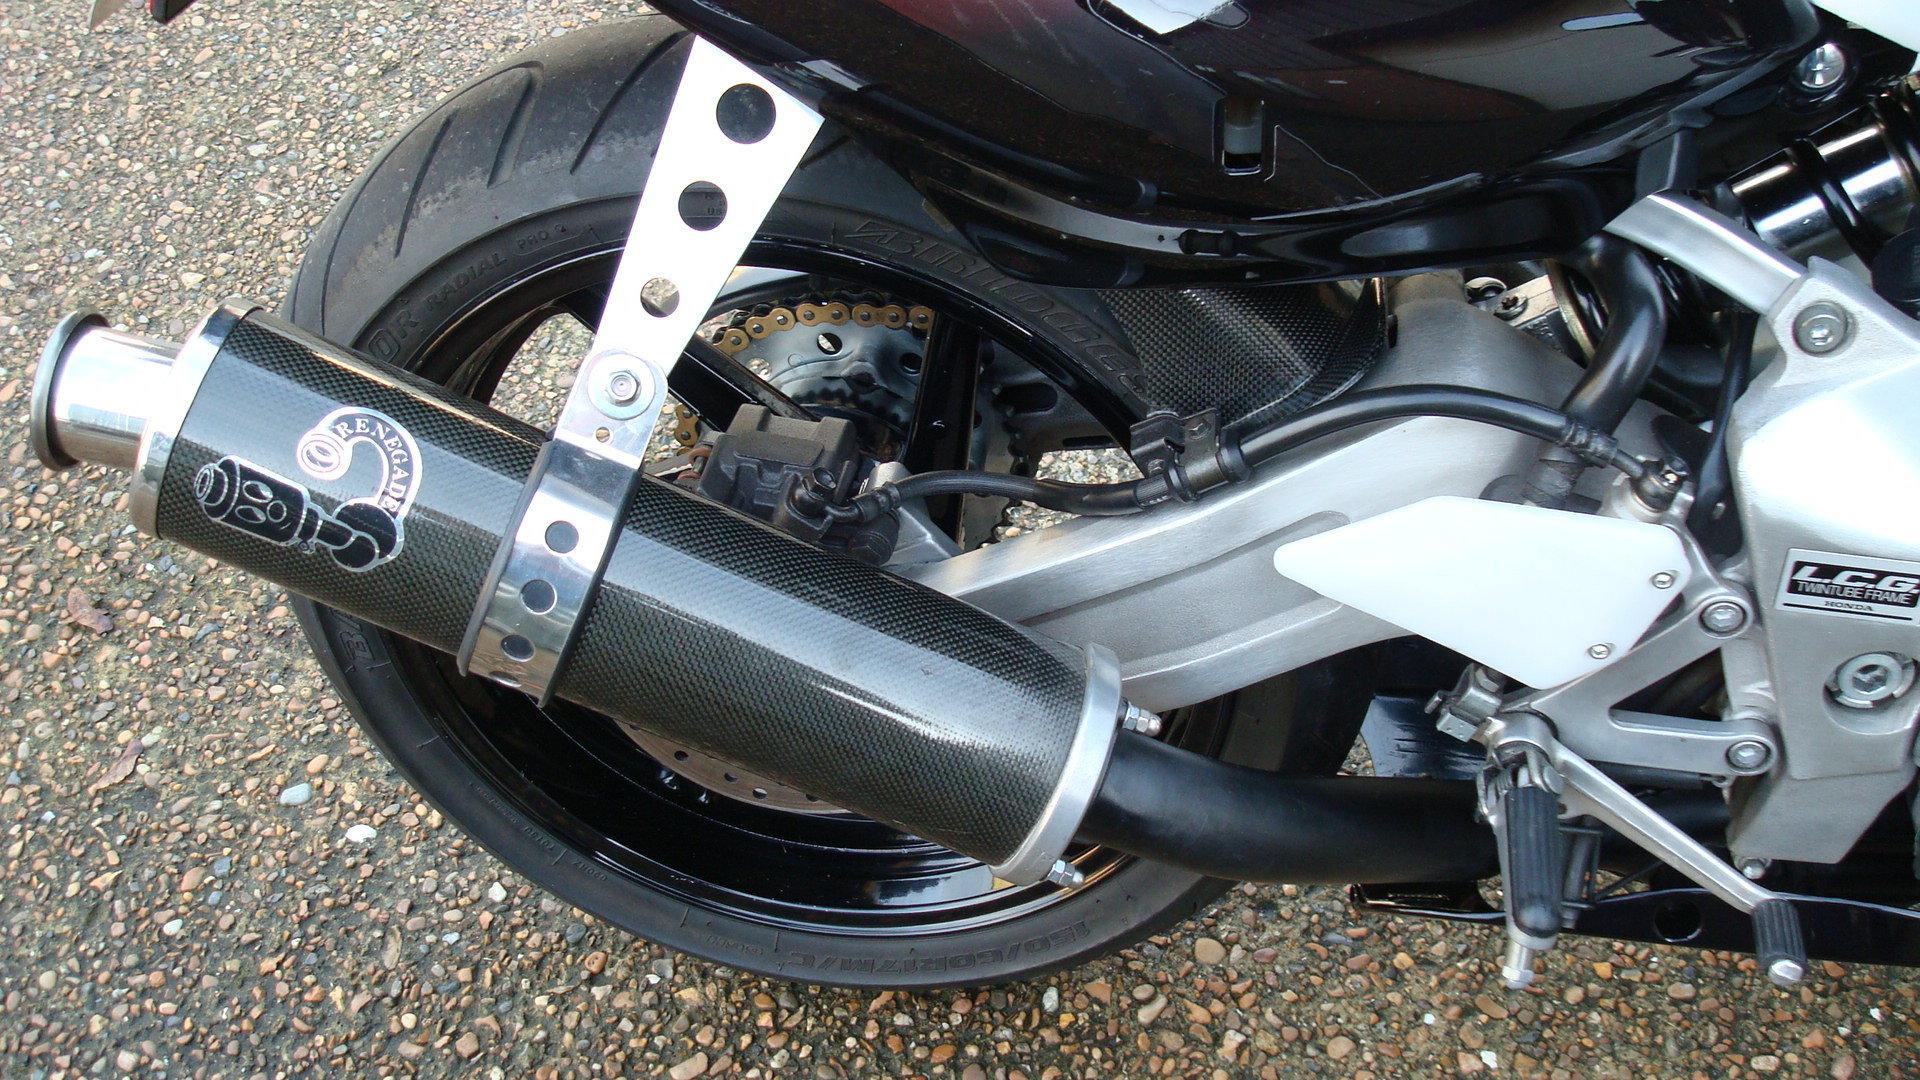 Honda CBR400 RR-R 1998-R **LOW KMS,EXCELLENT CONDITION** For Sale (picture 5 of 6)